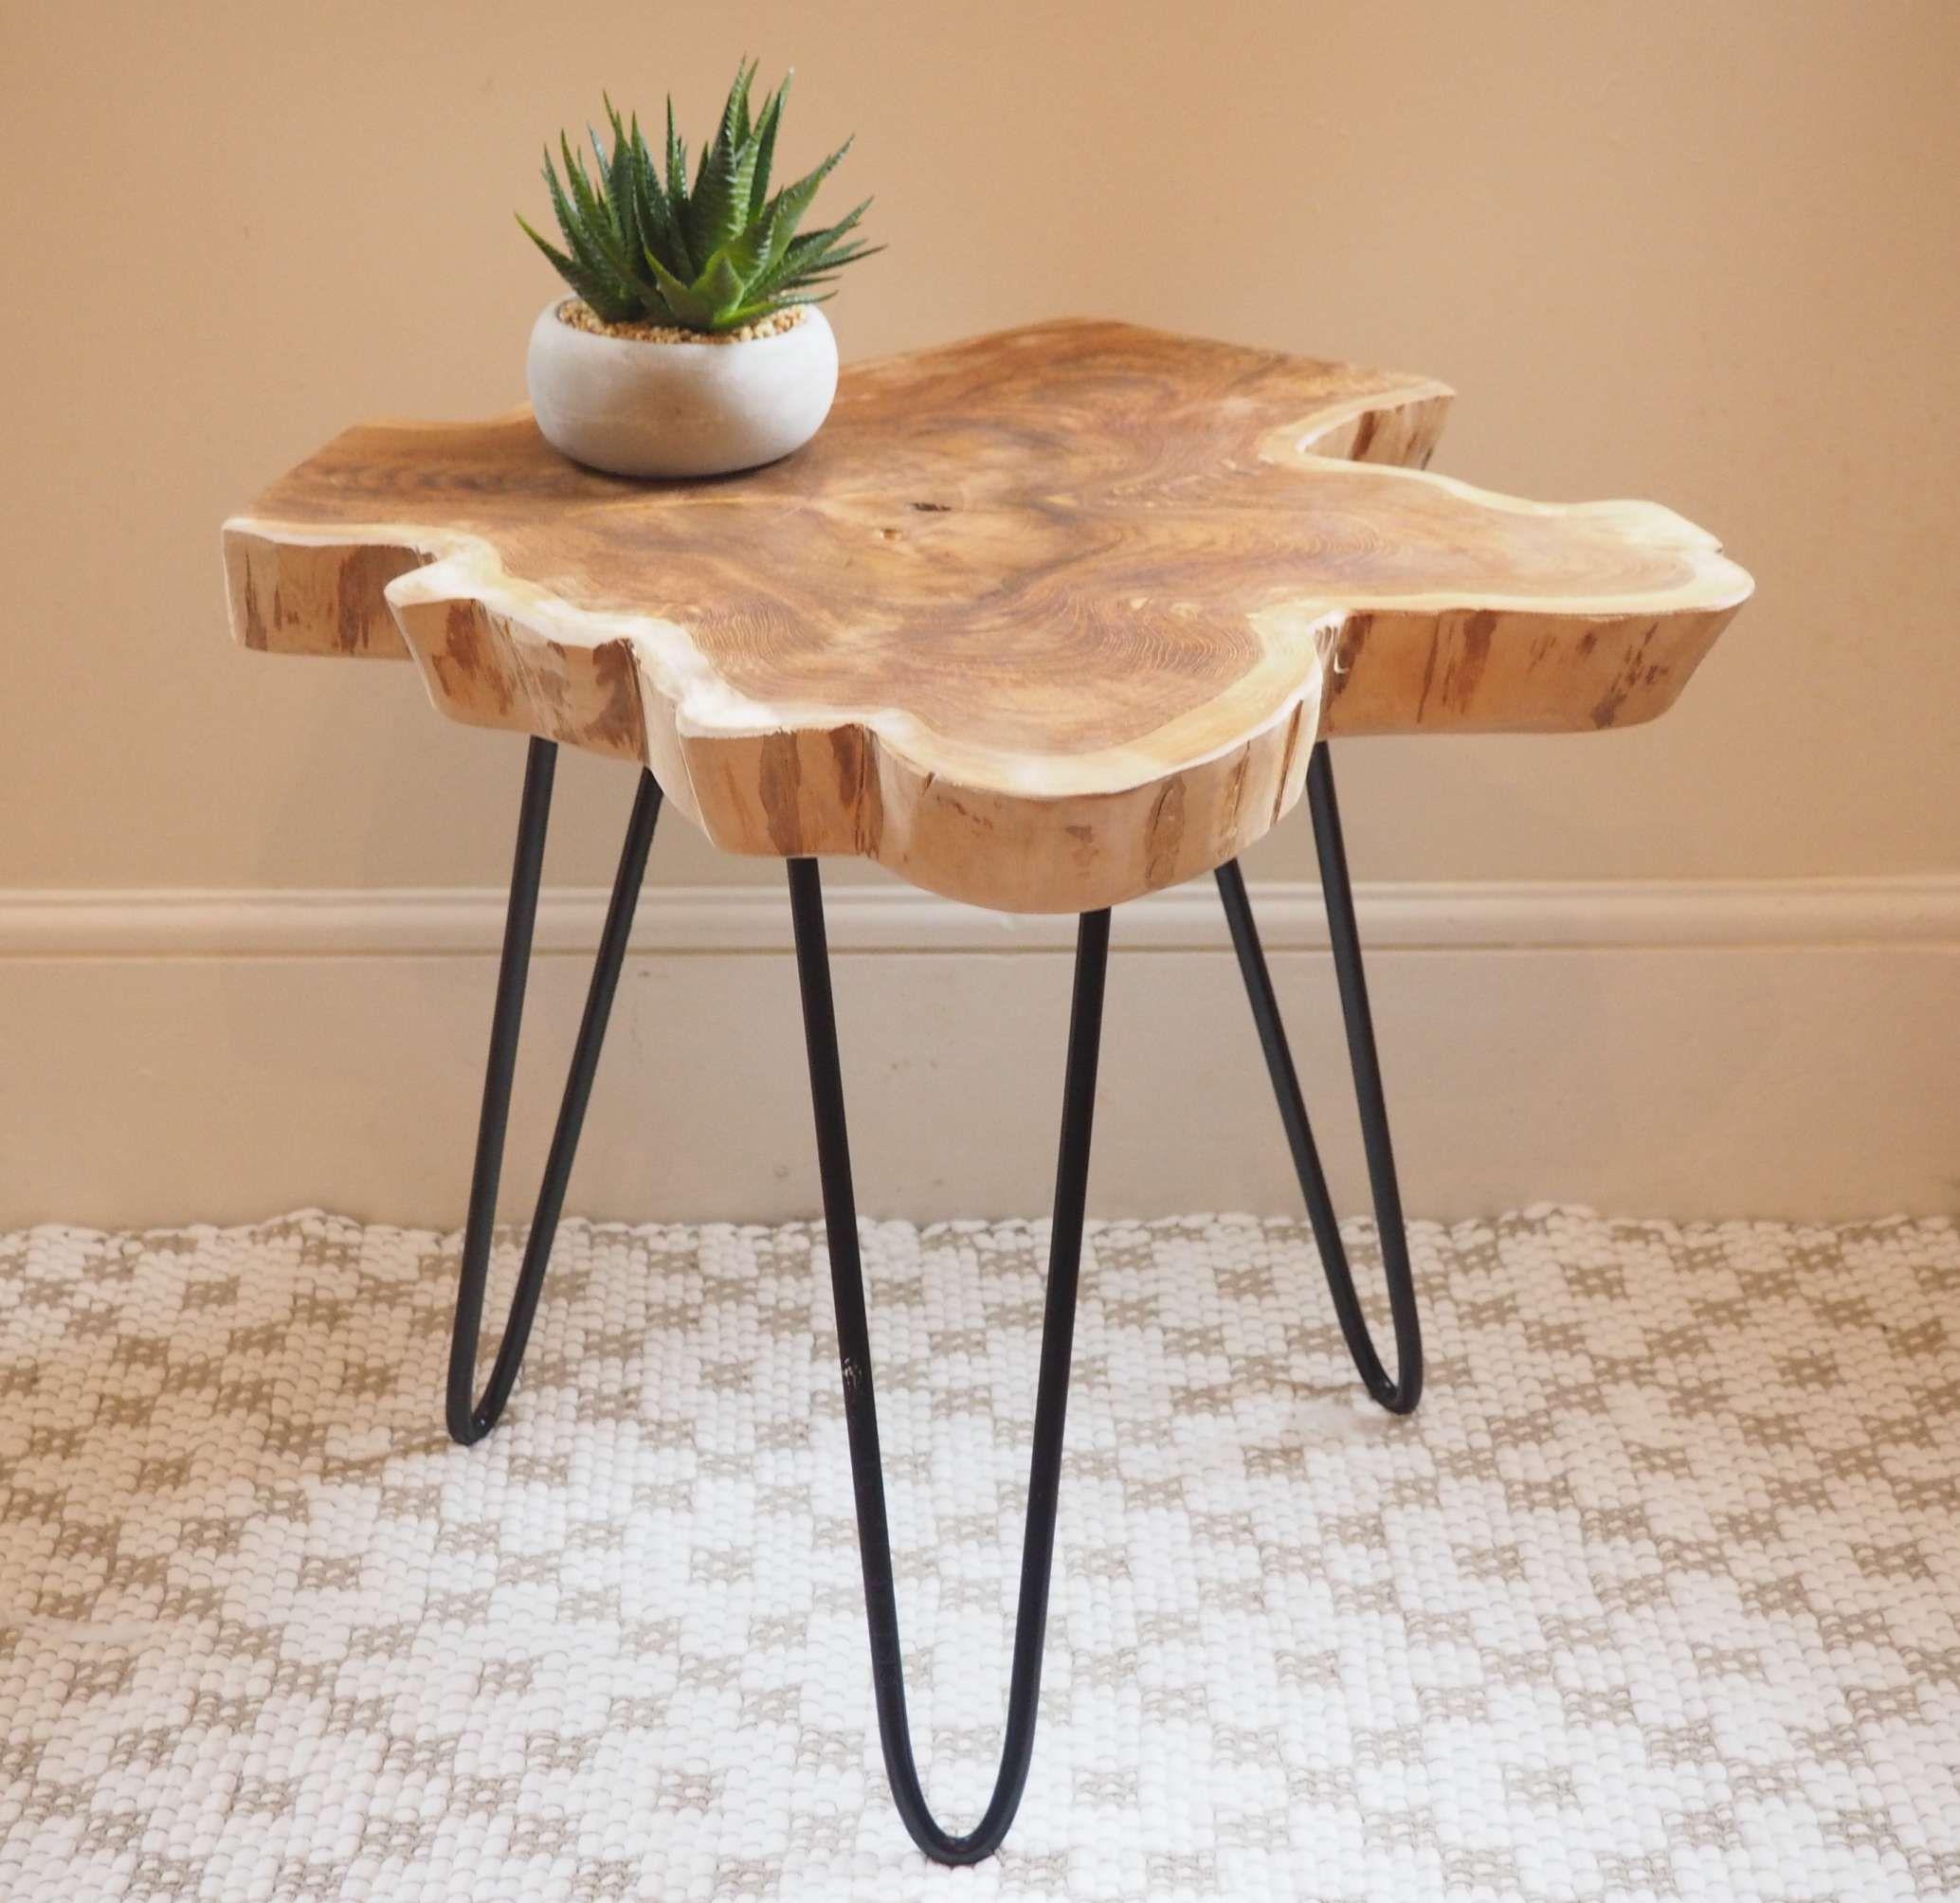 11 Amazing Wood Slice Side Table Photos Coffee Table Trunk Wood Slice Coffee Table Tree Coffee Table [ 2008 x 2068 Pixel ]